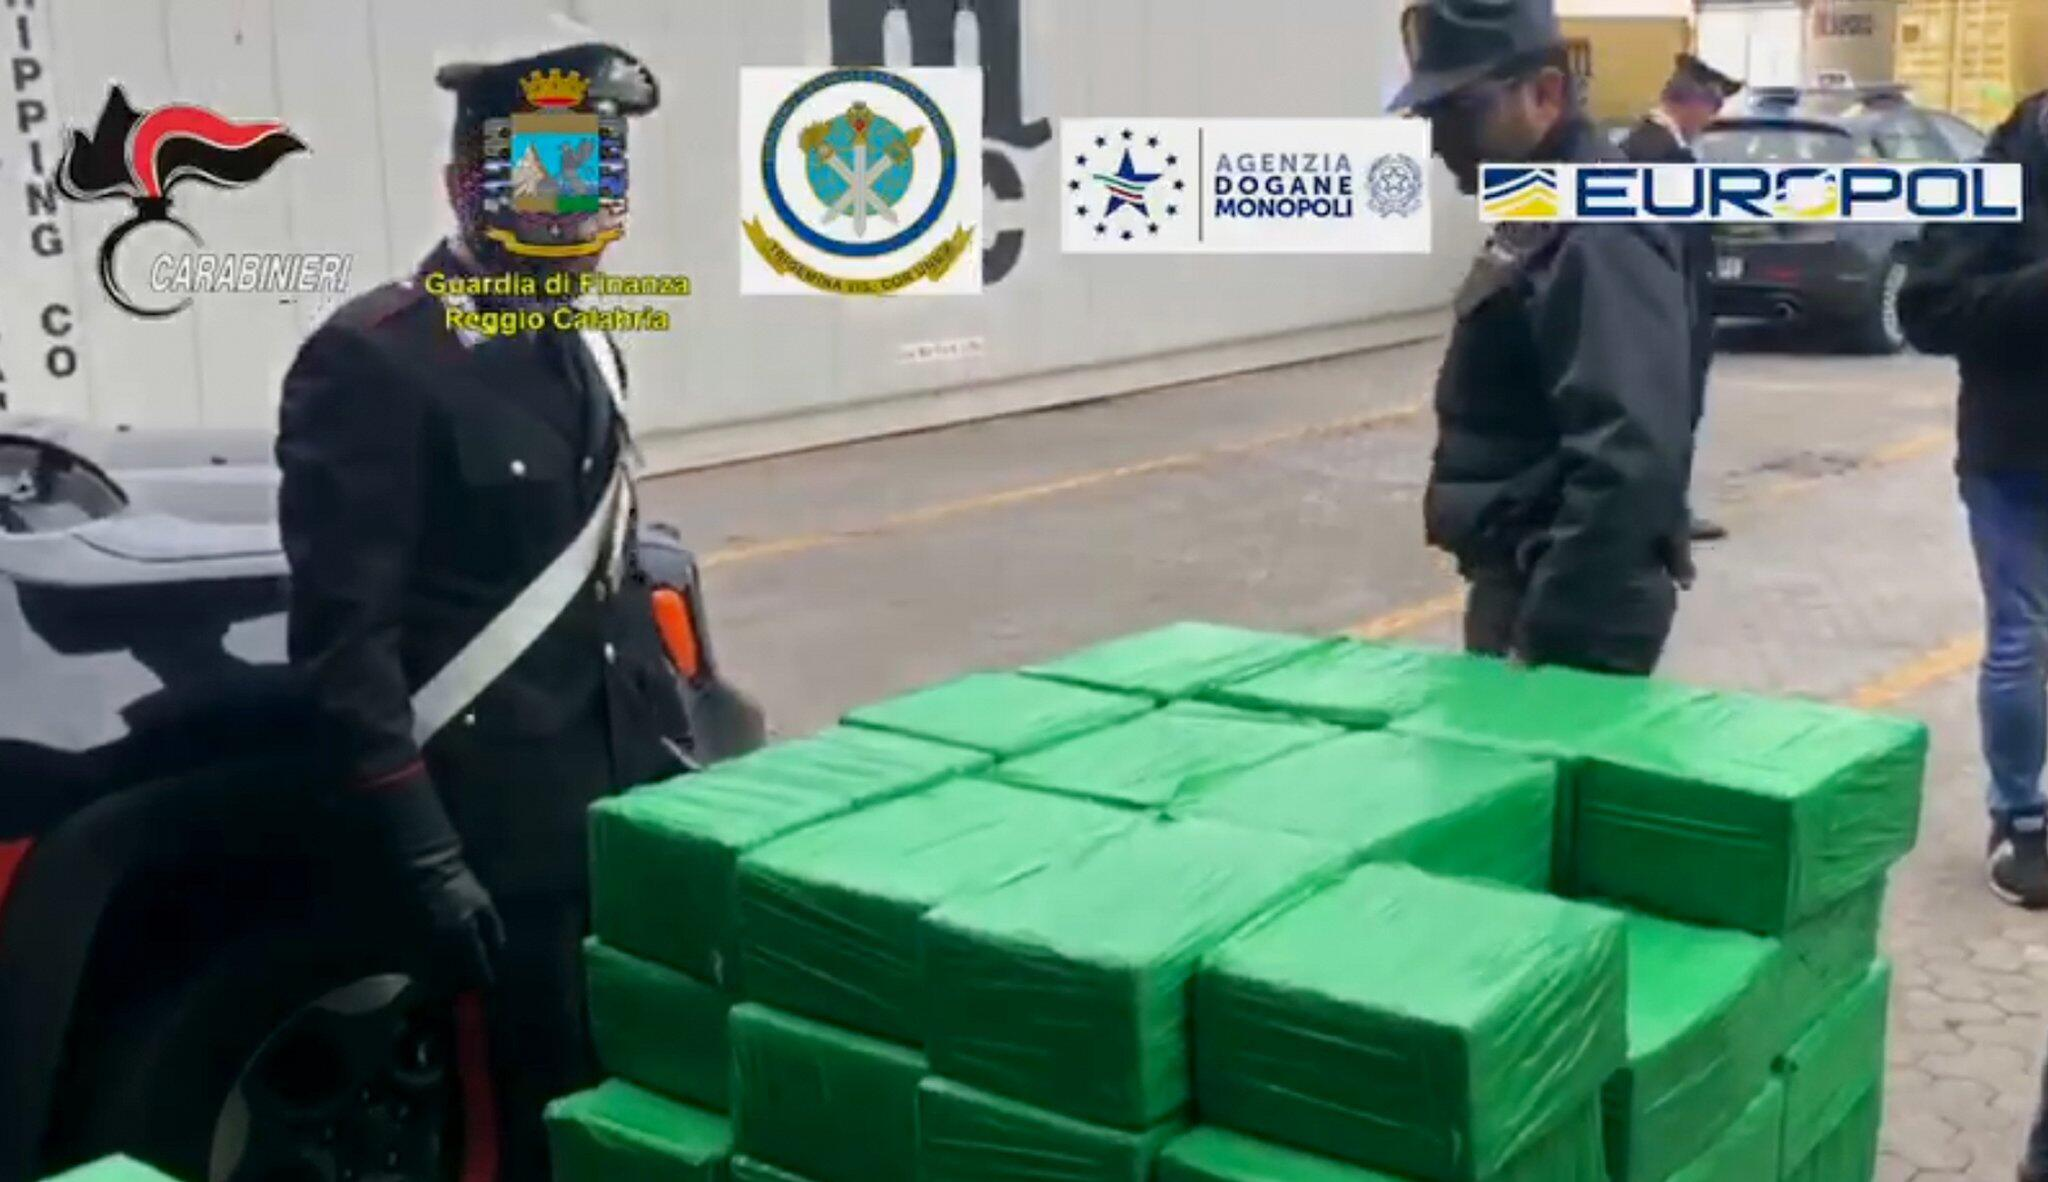 Italien: Fast 1200 Kilo Kokain in Bananenkisten gefunden - Ziel Deutschland